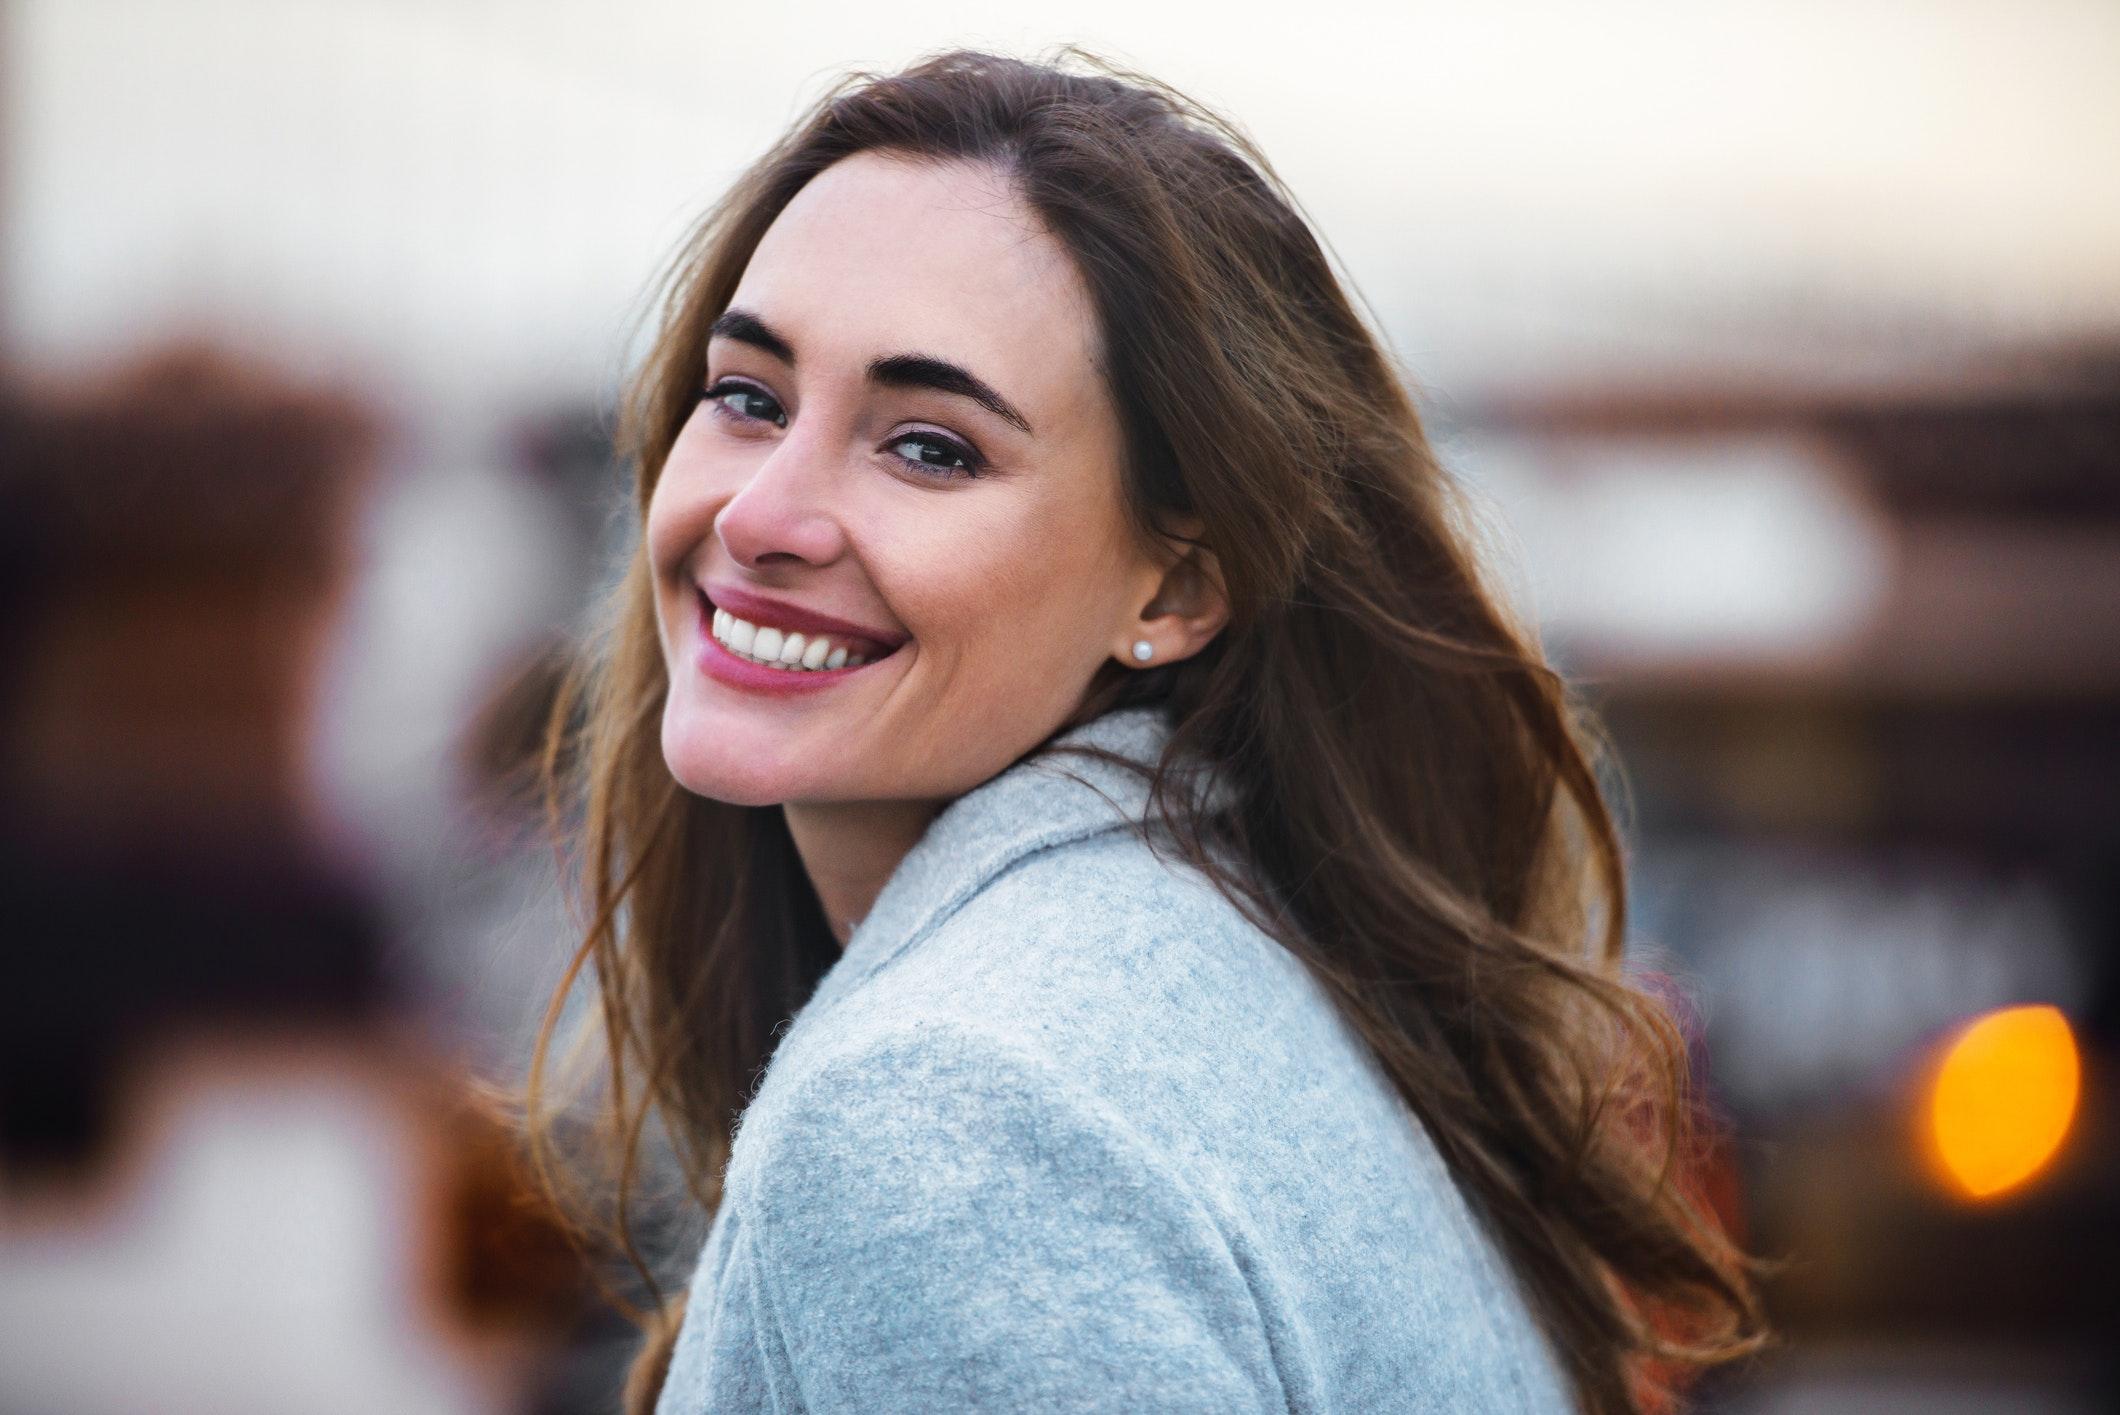 rencontre femme celibataire en polynesie